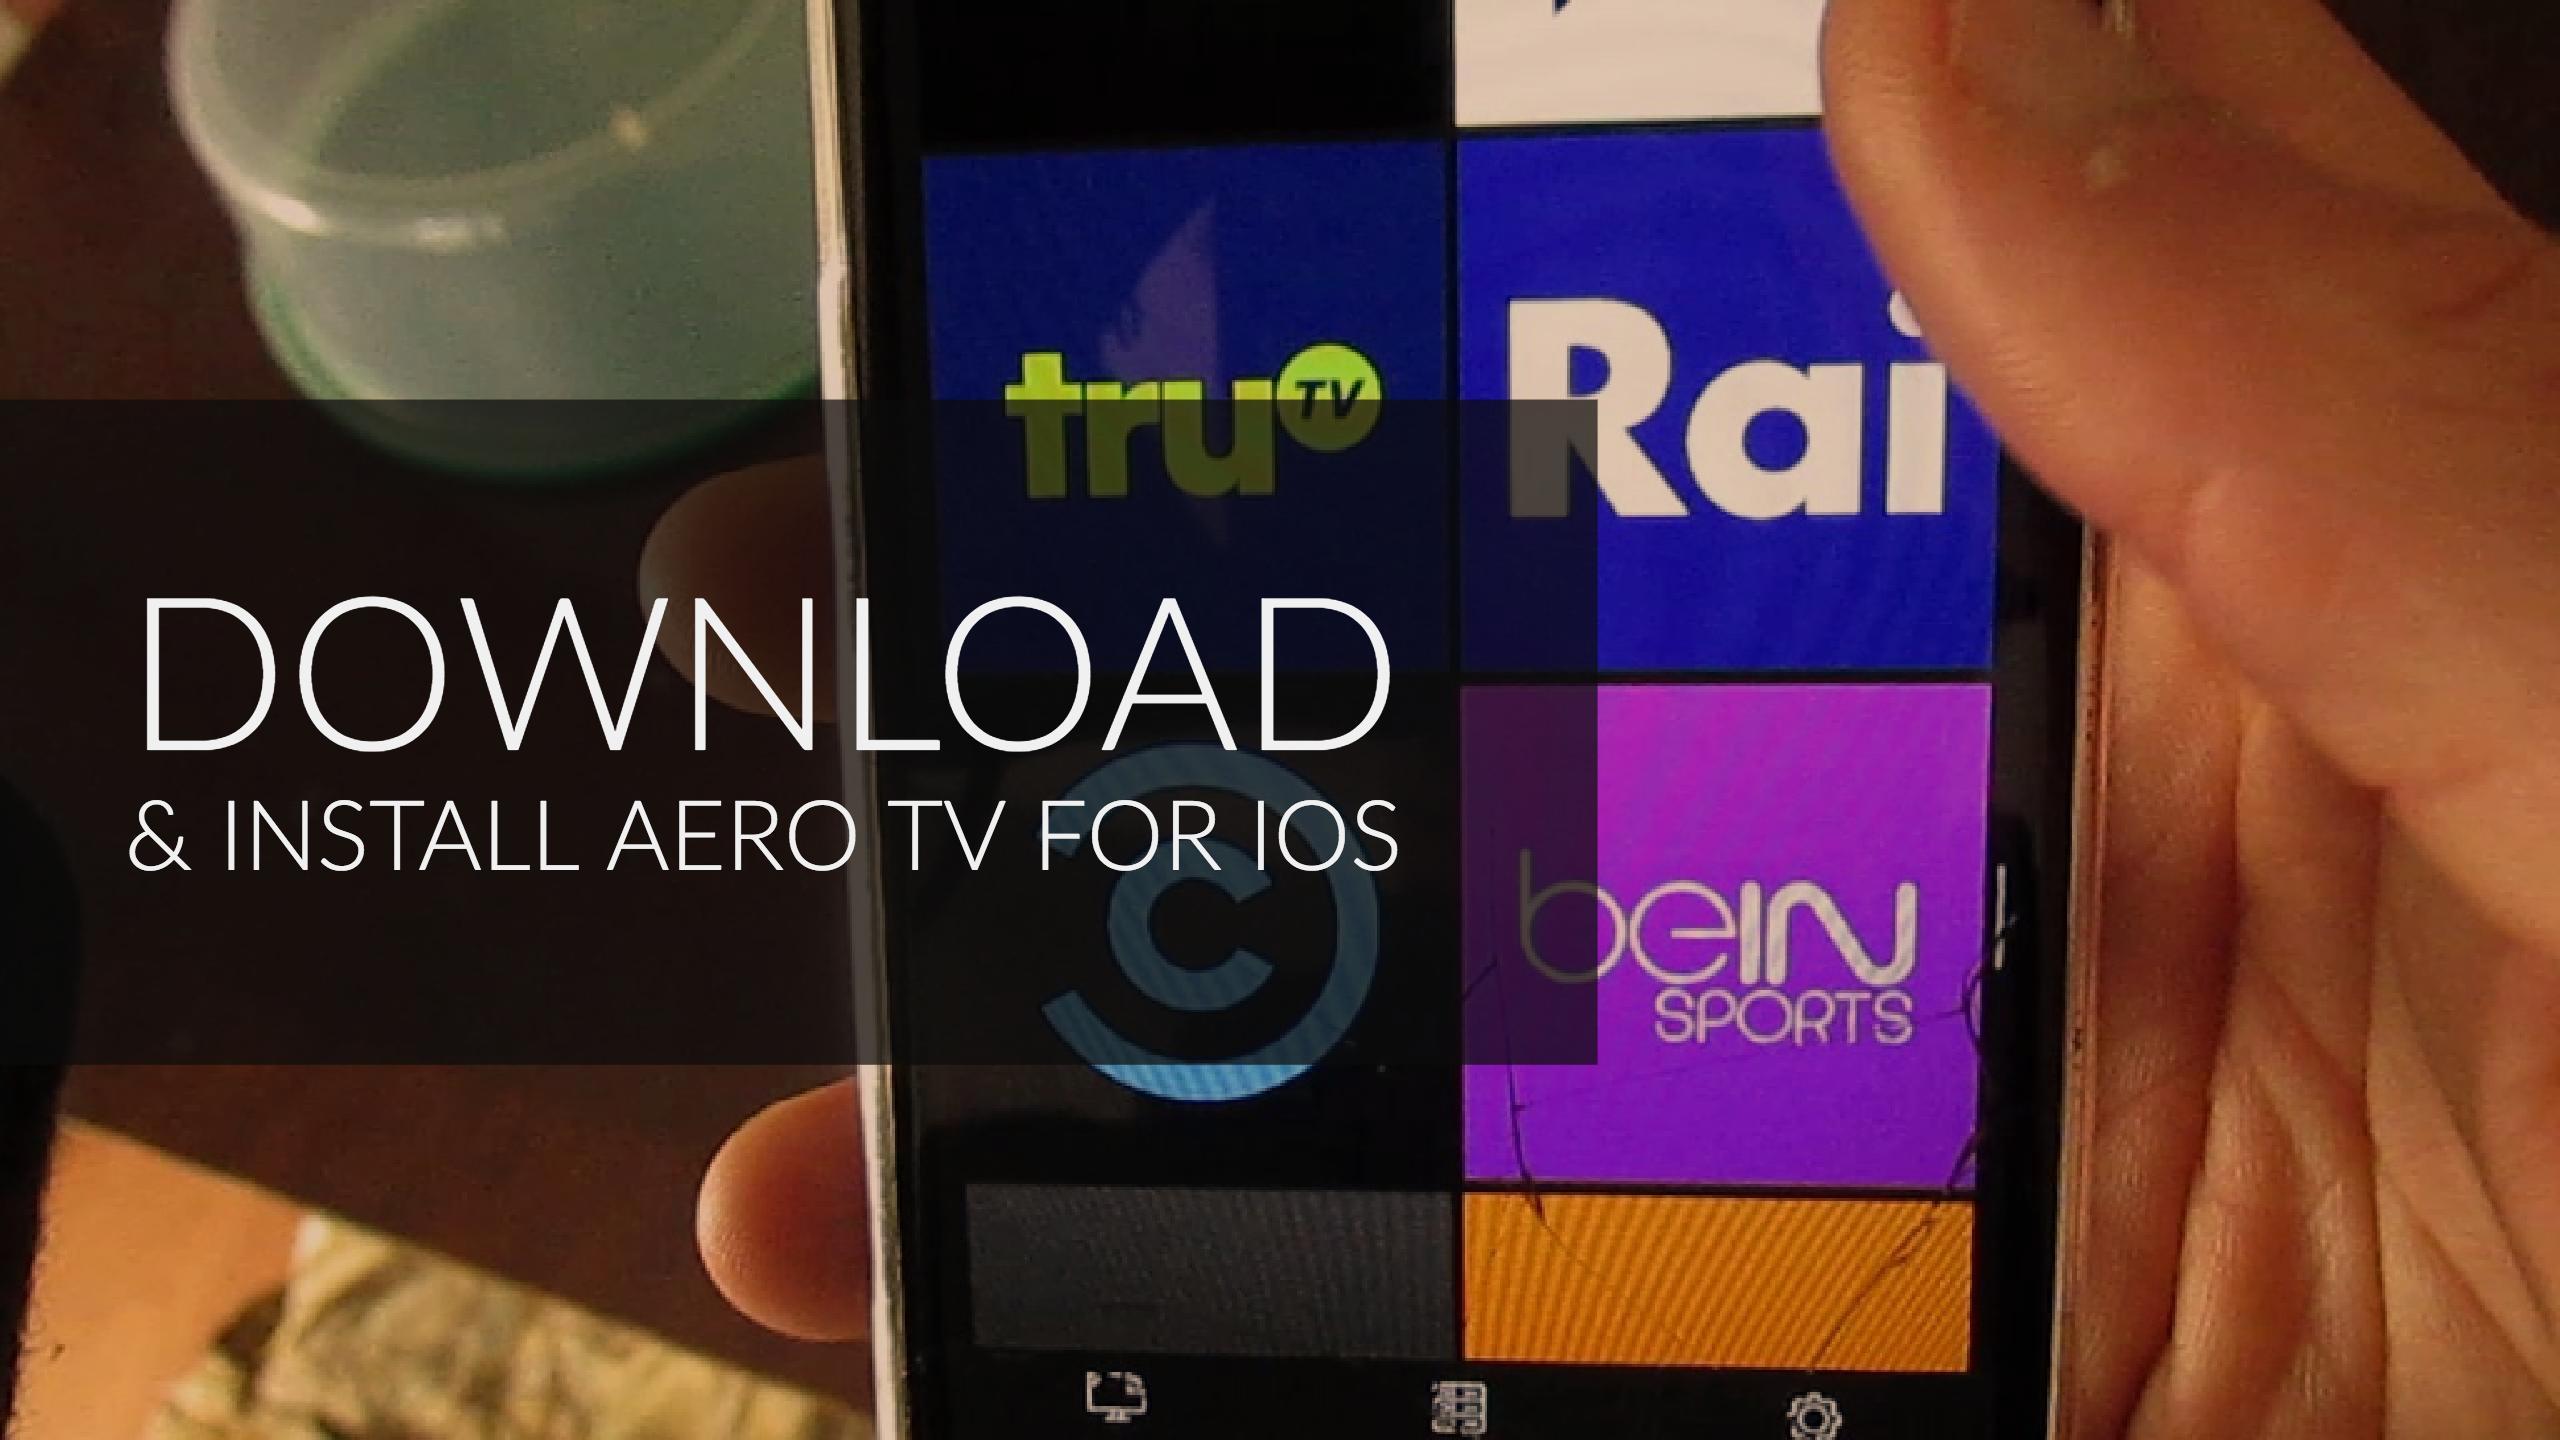 download aero tv app for iOS